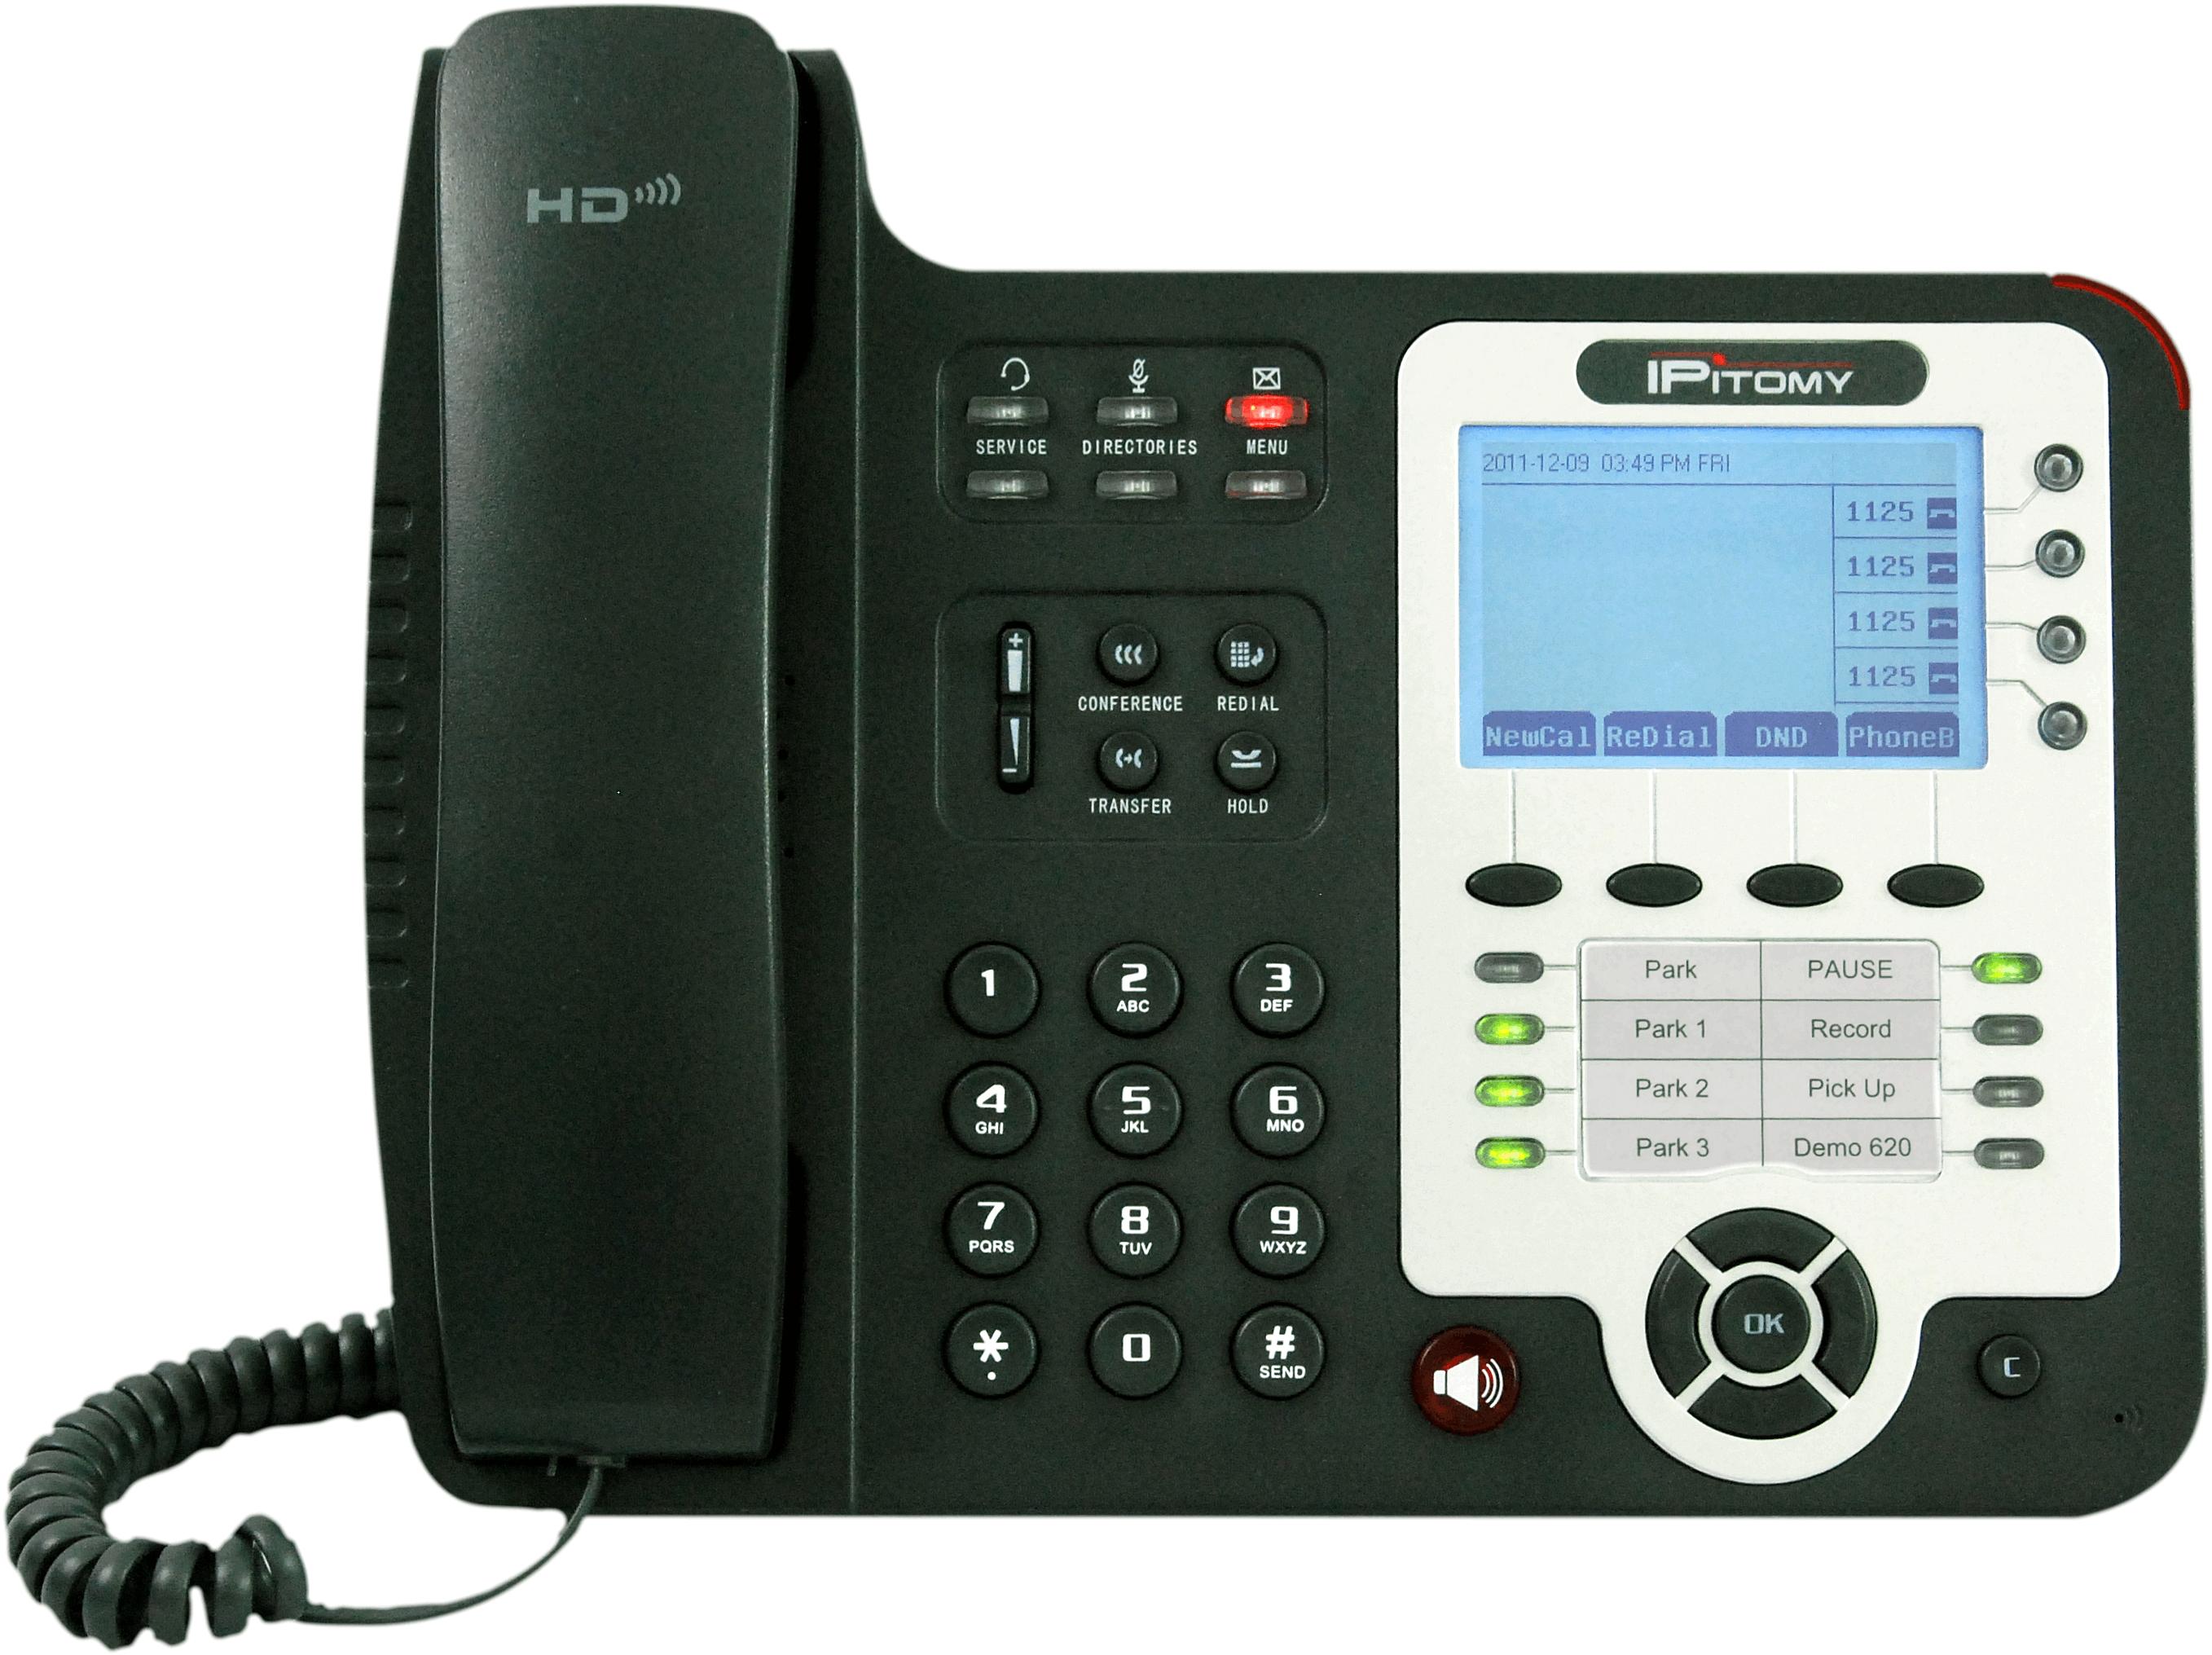 IP410